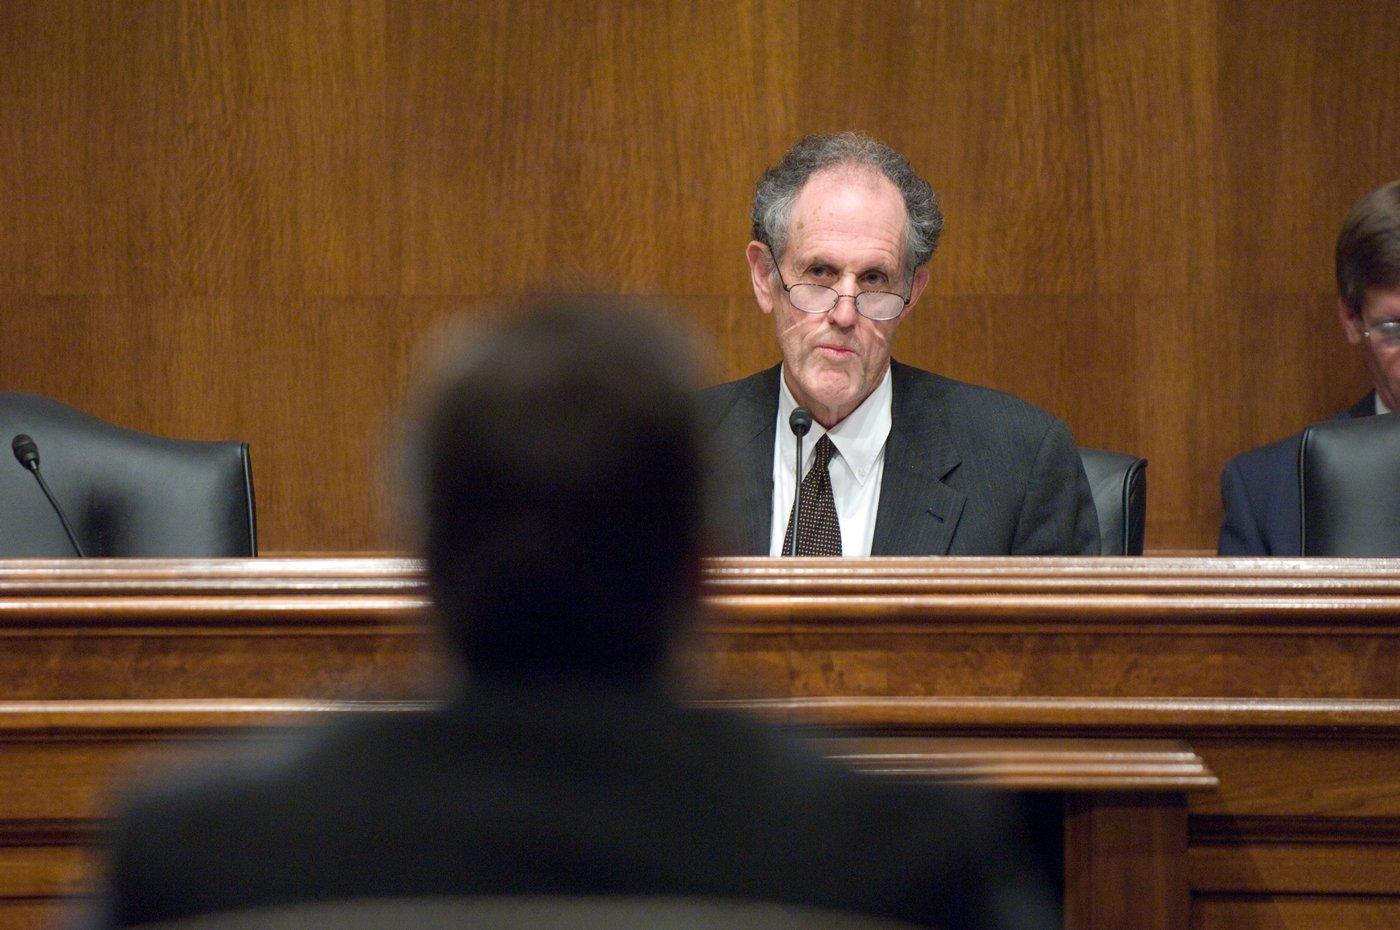 Photograph of Senate Judiciary Committee hearing, 2009 December 9